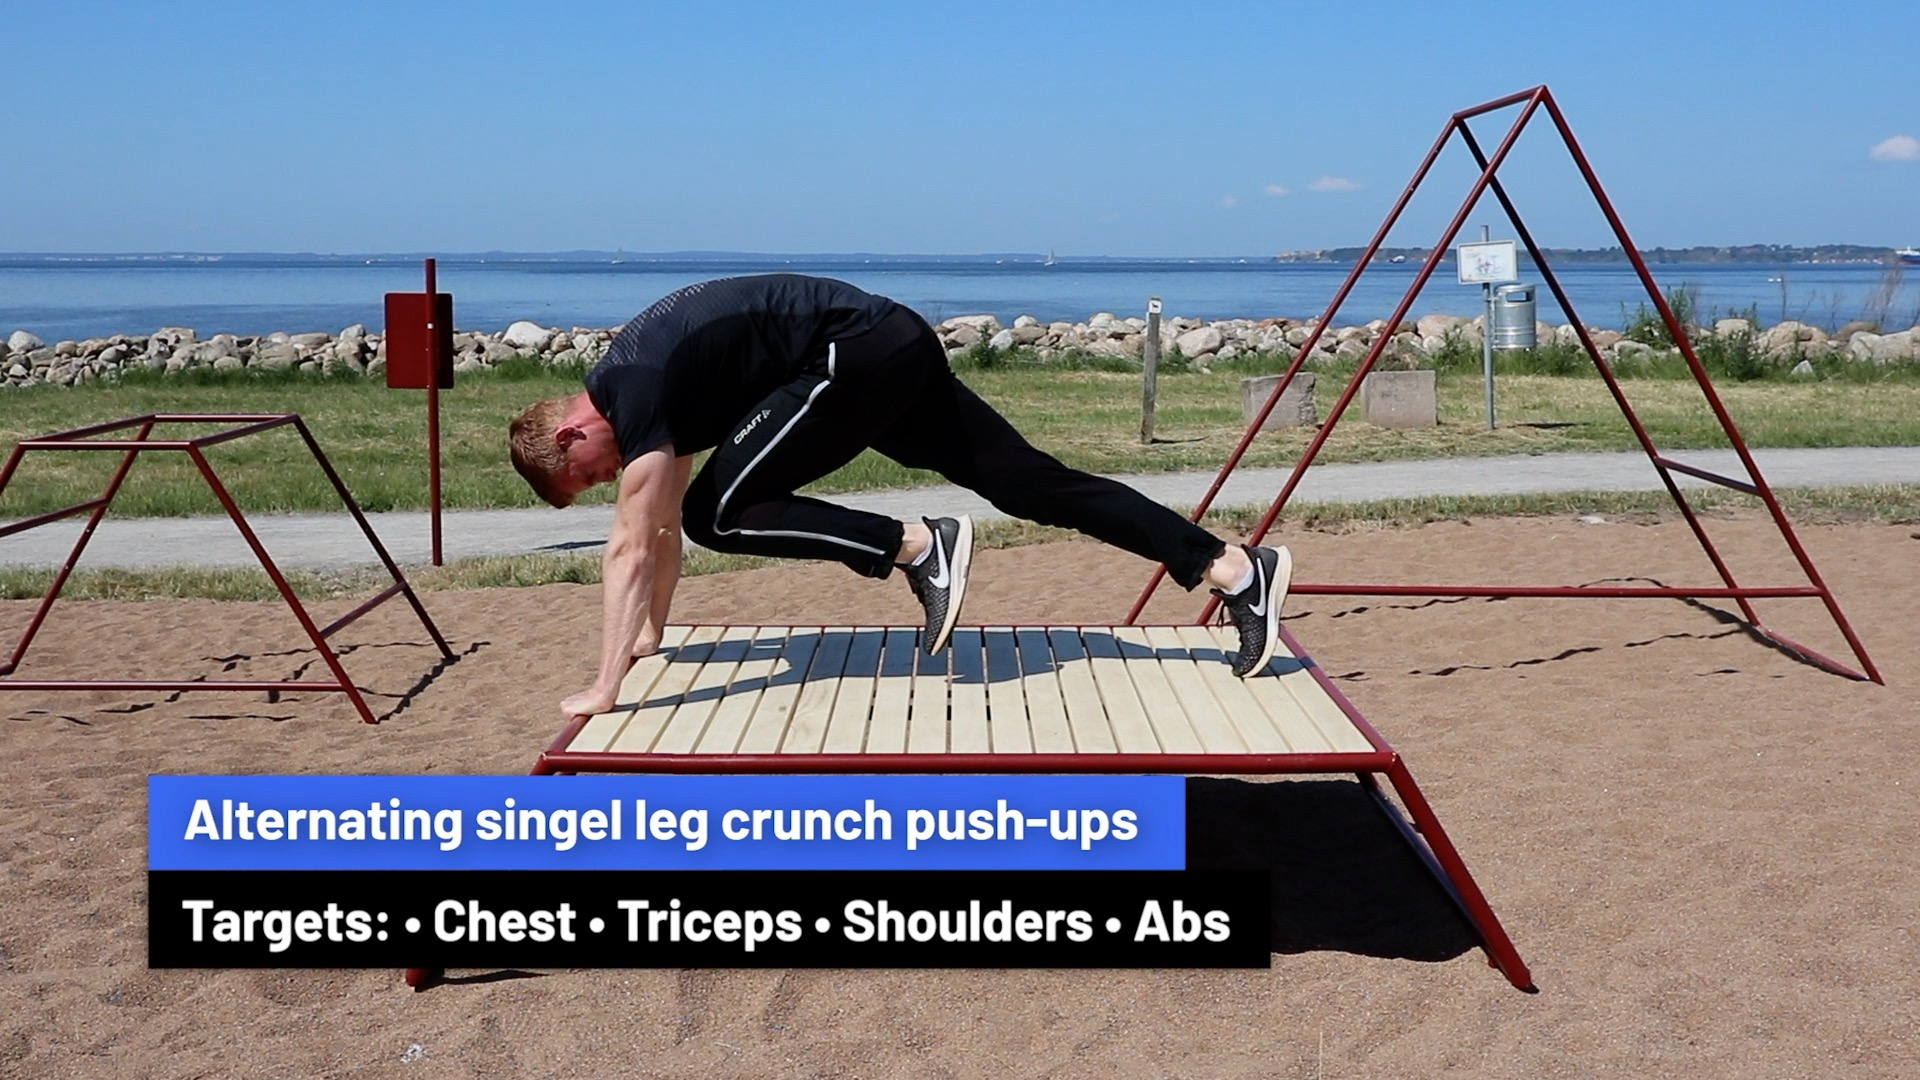 Alternating single leg crunch push-ups